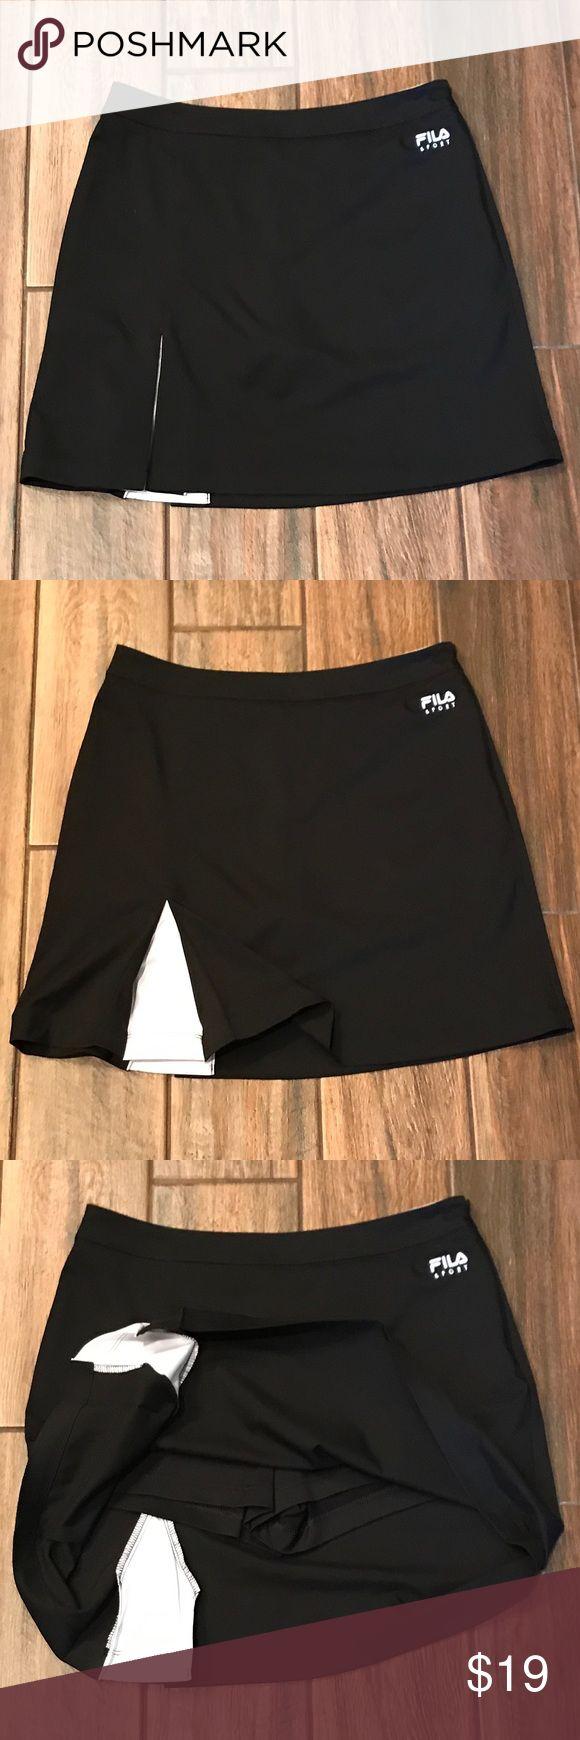 🏌️♀️ LNWOT women's golf skirt; non-smoking home 🏌️♀️NWOT Women's golf skirt, no stains or holes, shorts are under the skirt; non-smoking home Fila Sport Skirts